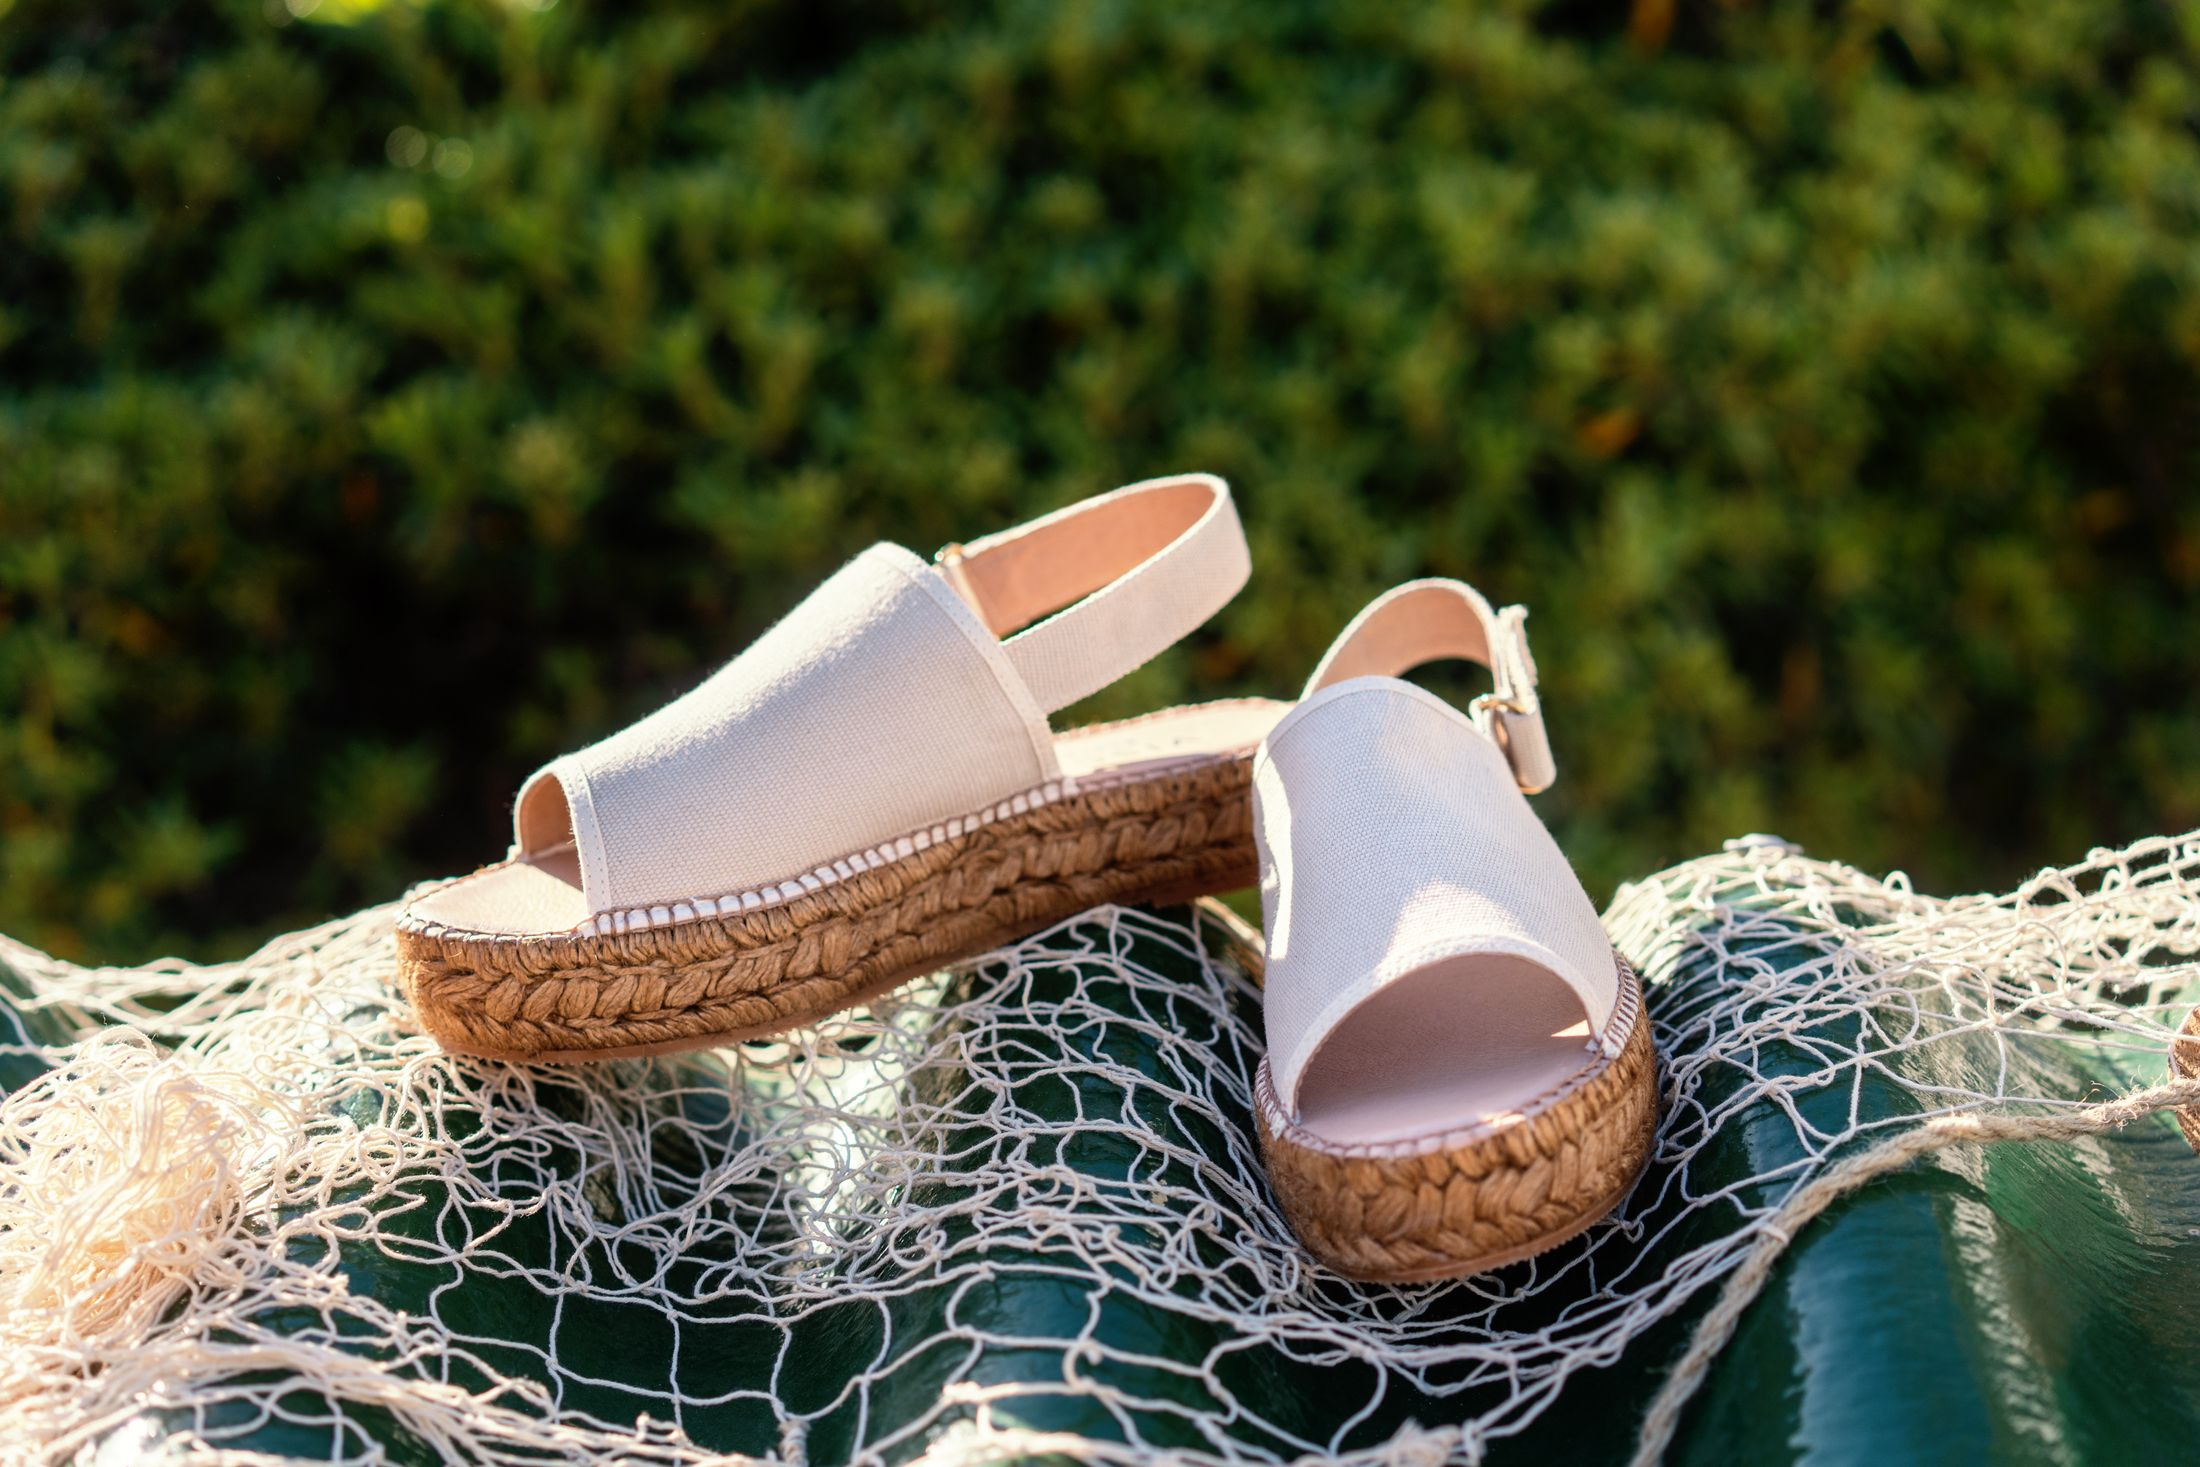 203f9f8f05 New Styles Alert (!) tap link in bio to shop your Viscata's espadrilles  #shoes #viscata #espadrilles